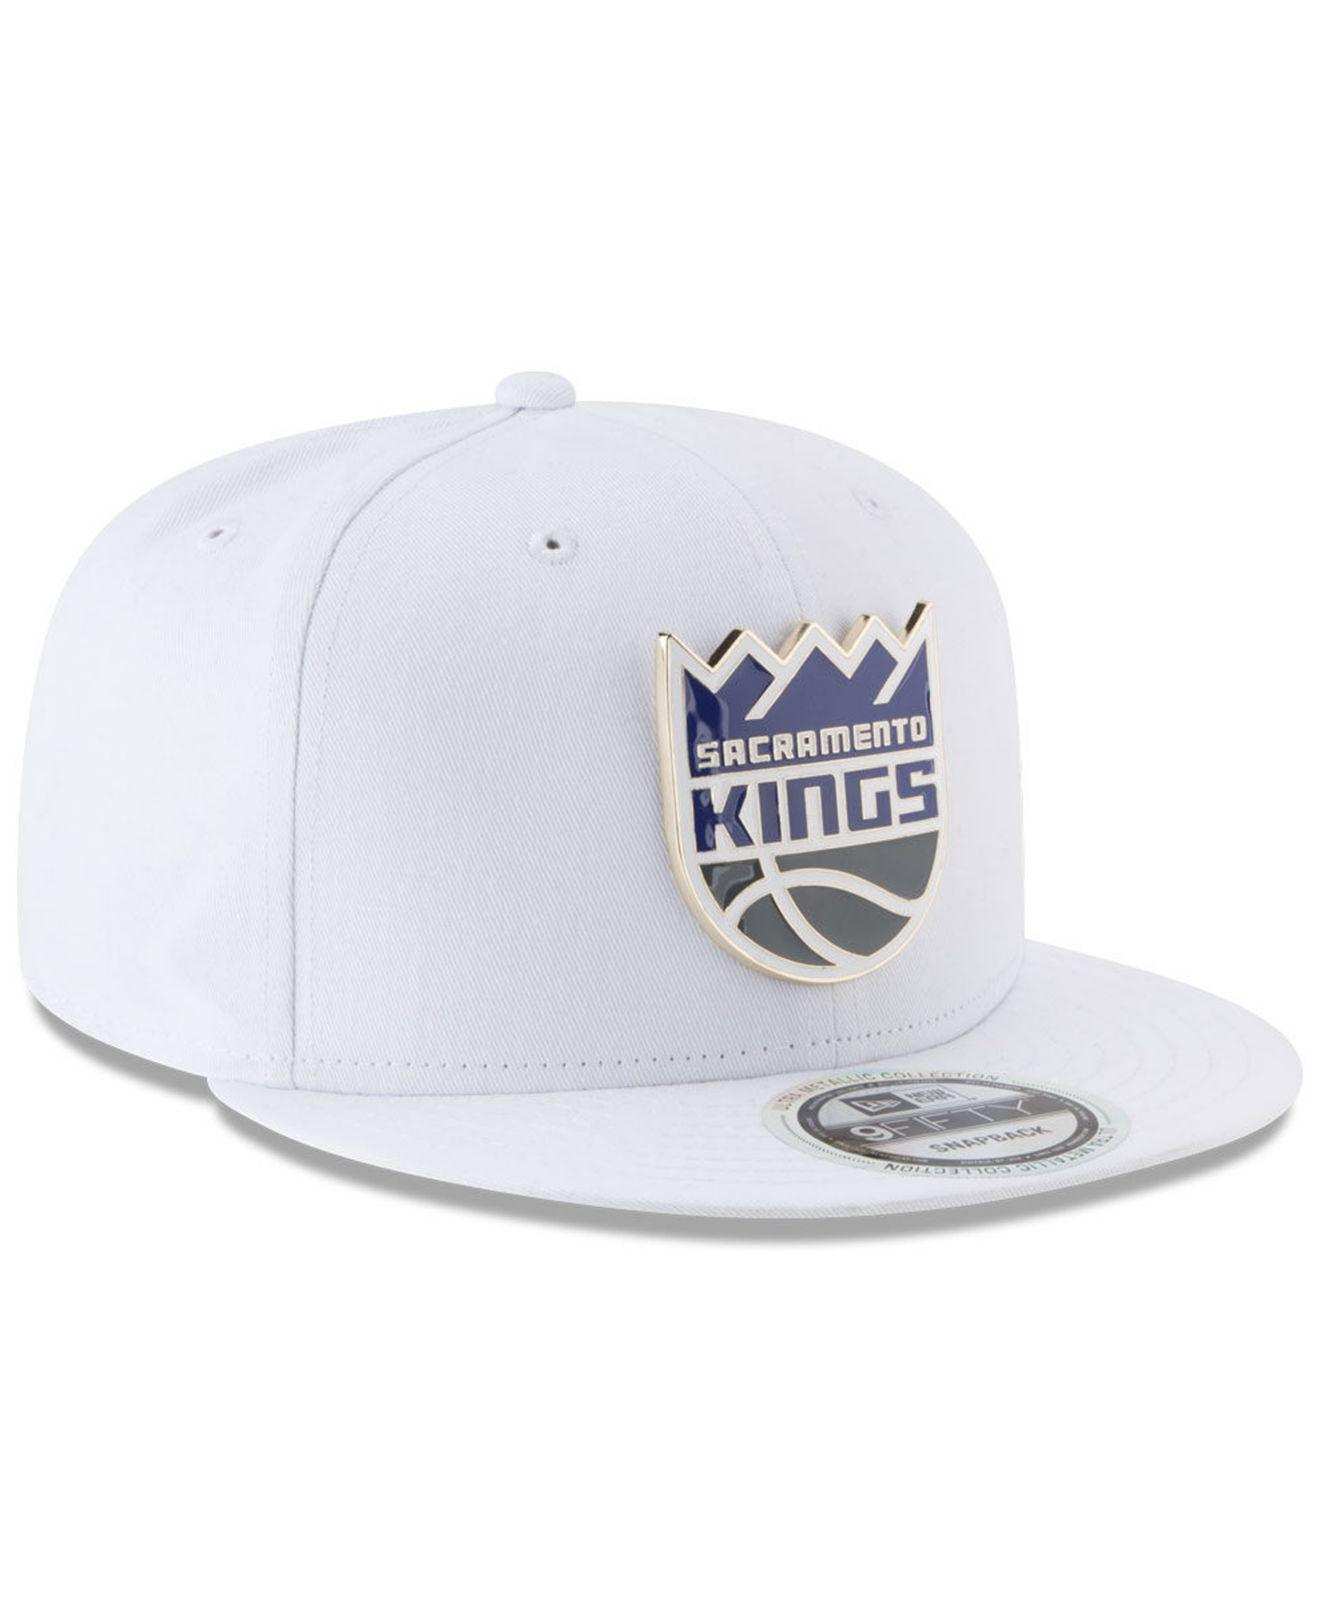 reputable site 0ab9a 2dd83 Lyst - KTZ Sacramento Kings Enamel Badge 9fifty Snapback Cap in ...